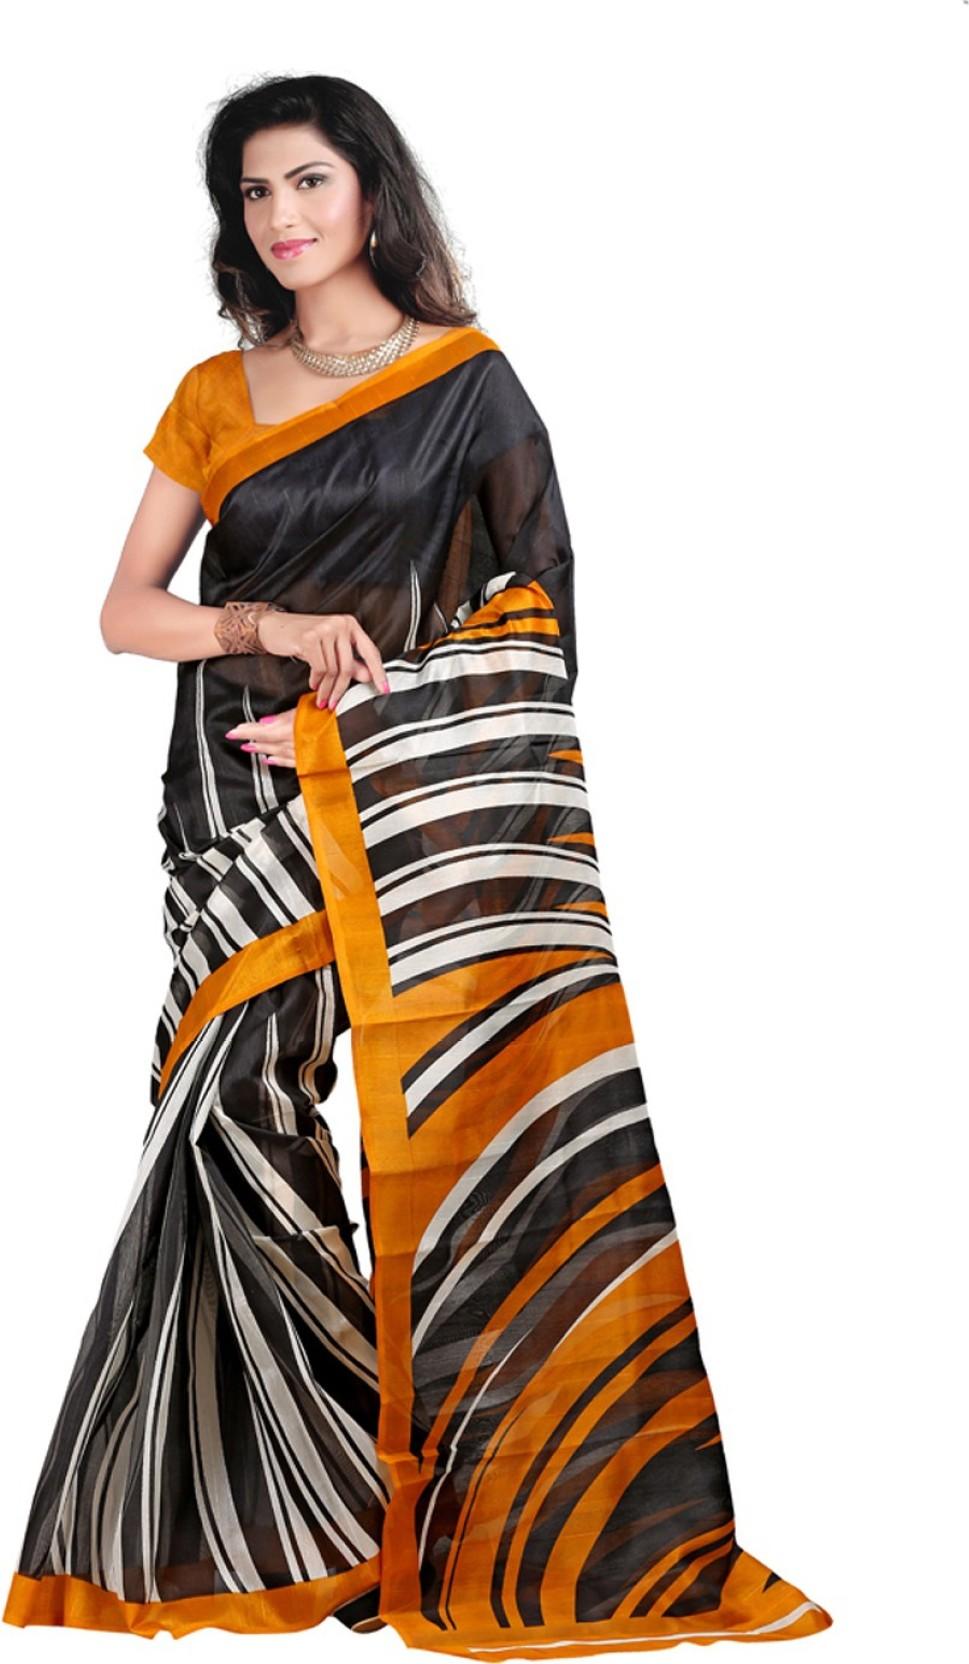 545c3136e4 Buy Wwskey Printed Bhagalpuri Silk Black, Yellow Sarees Online ...